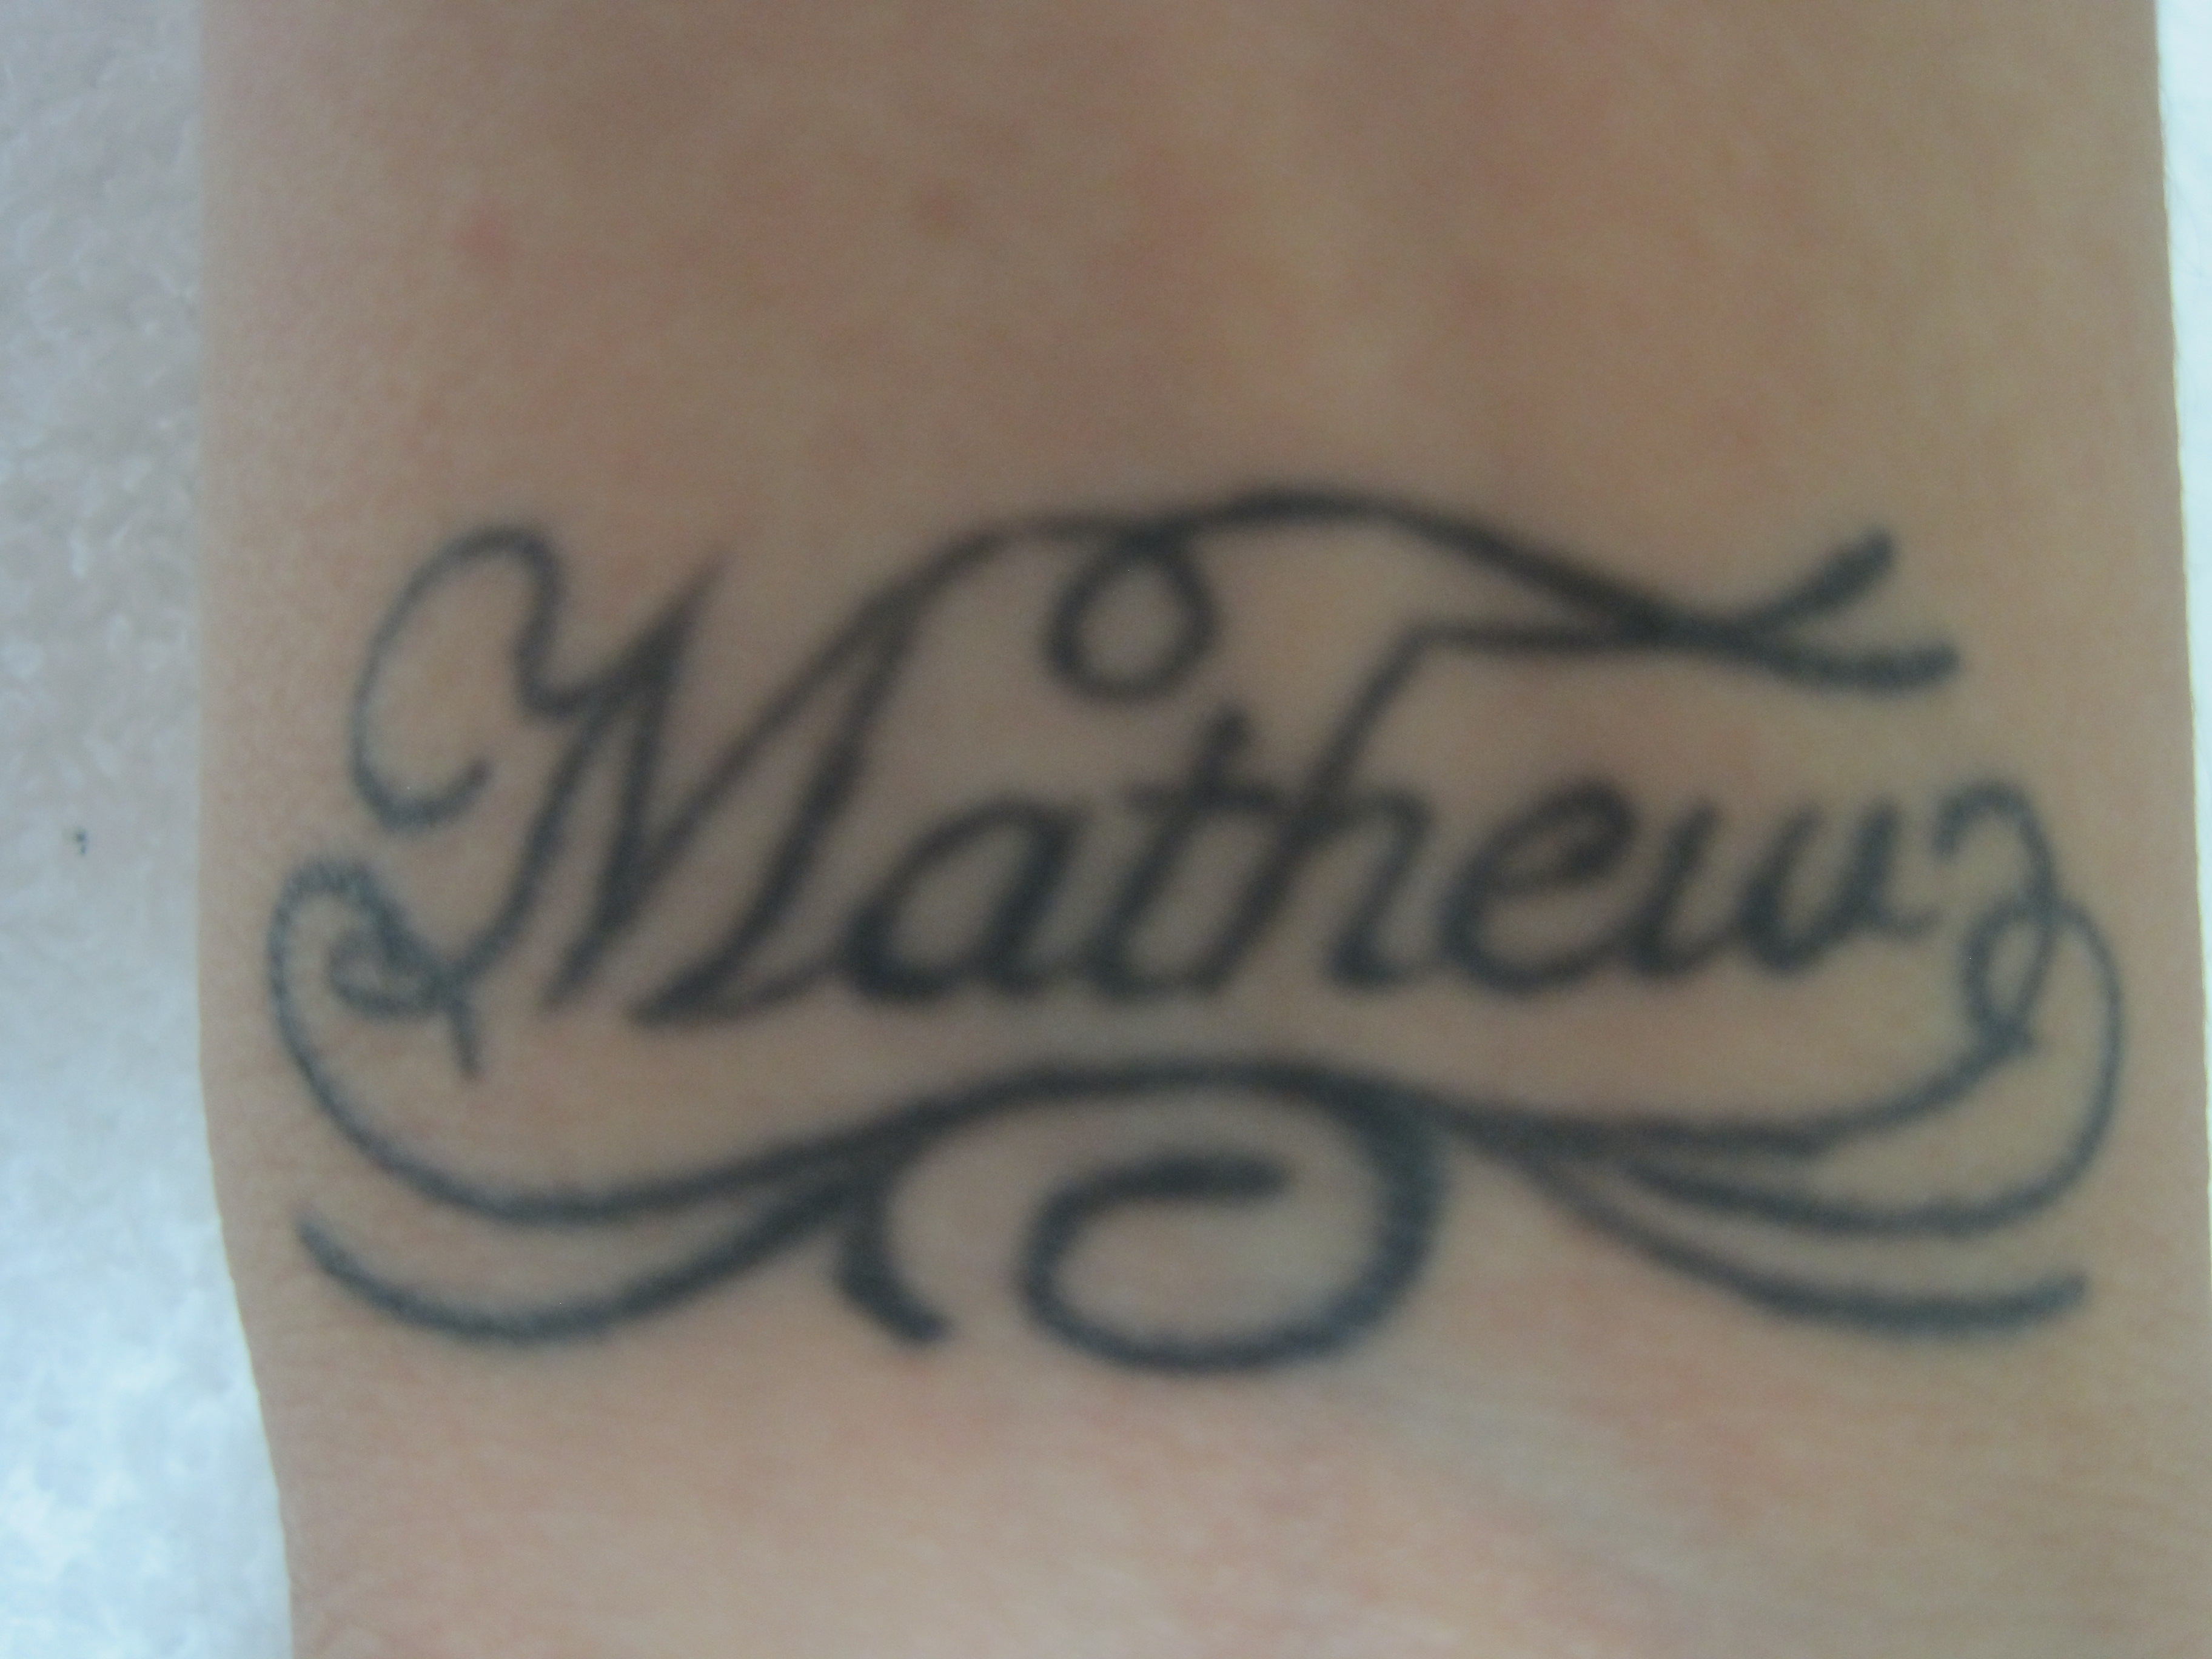 Tattoo on inner wrist